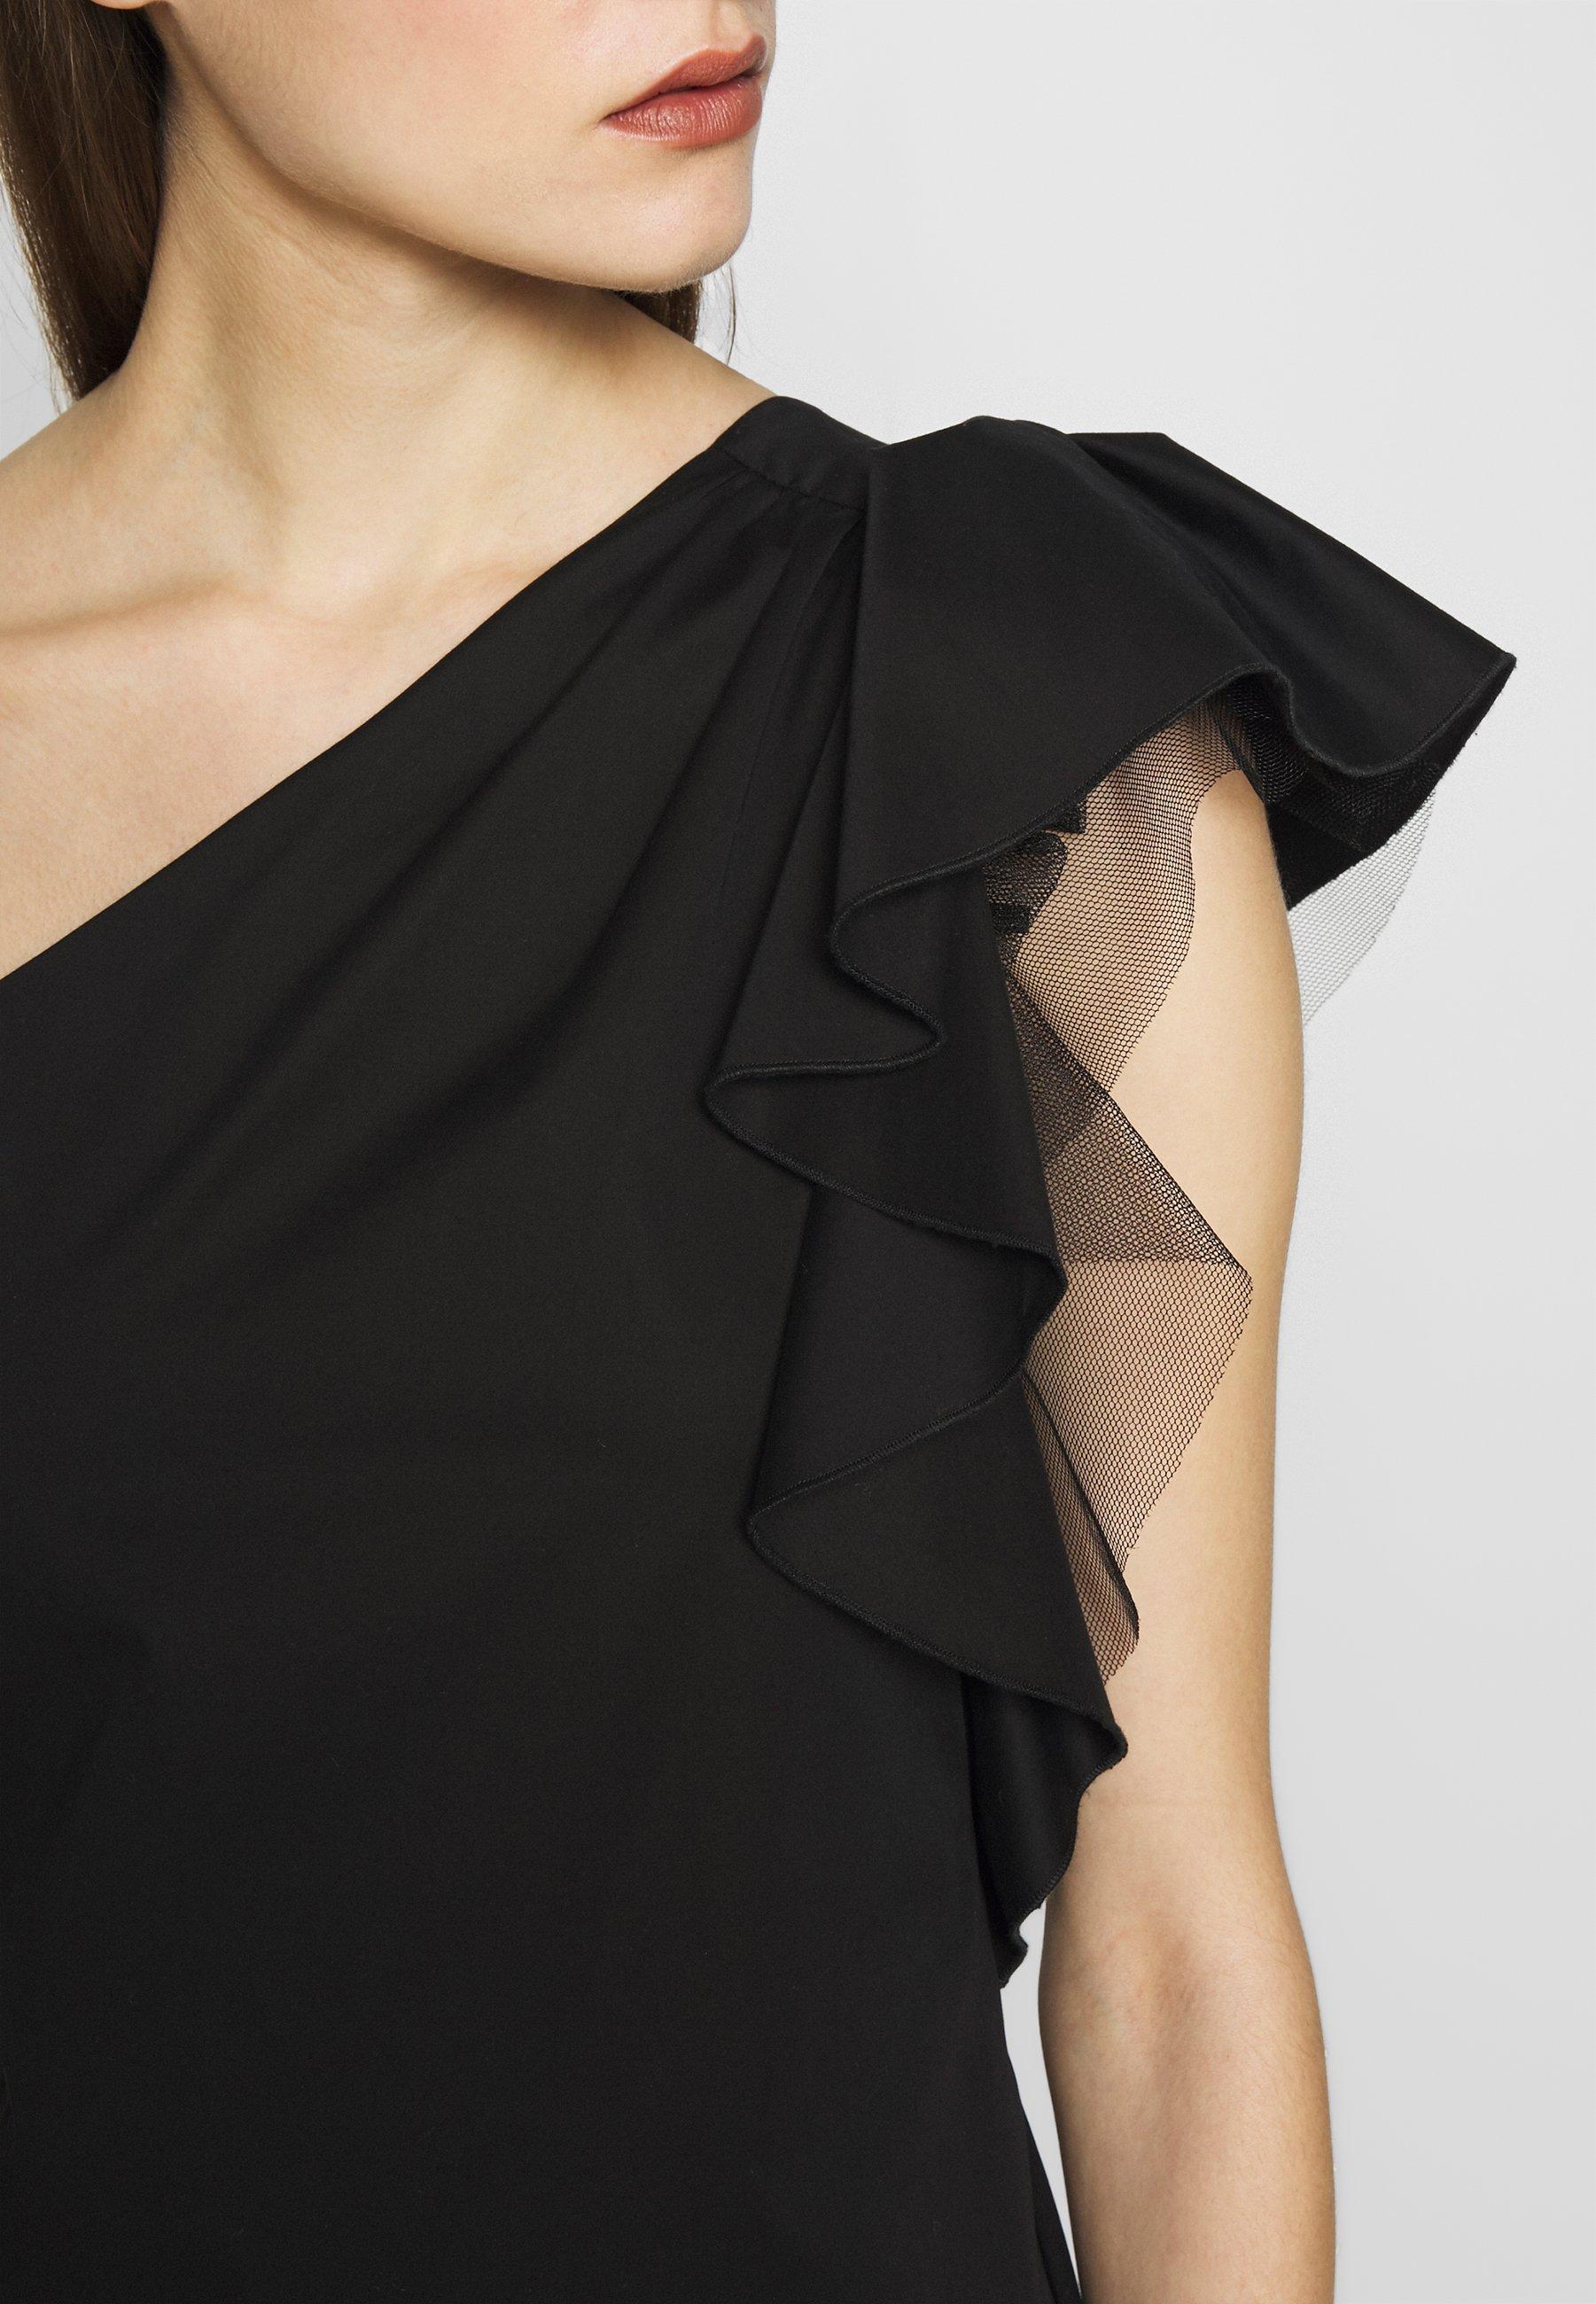 Erittäin Naisten Vaatteet Sarja ddj54584sfGHYHD Birgitte Herskind TAYLOR SHORT DRESS Juhlamekko black